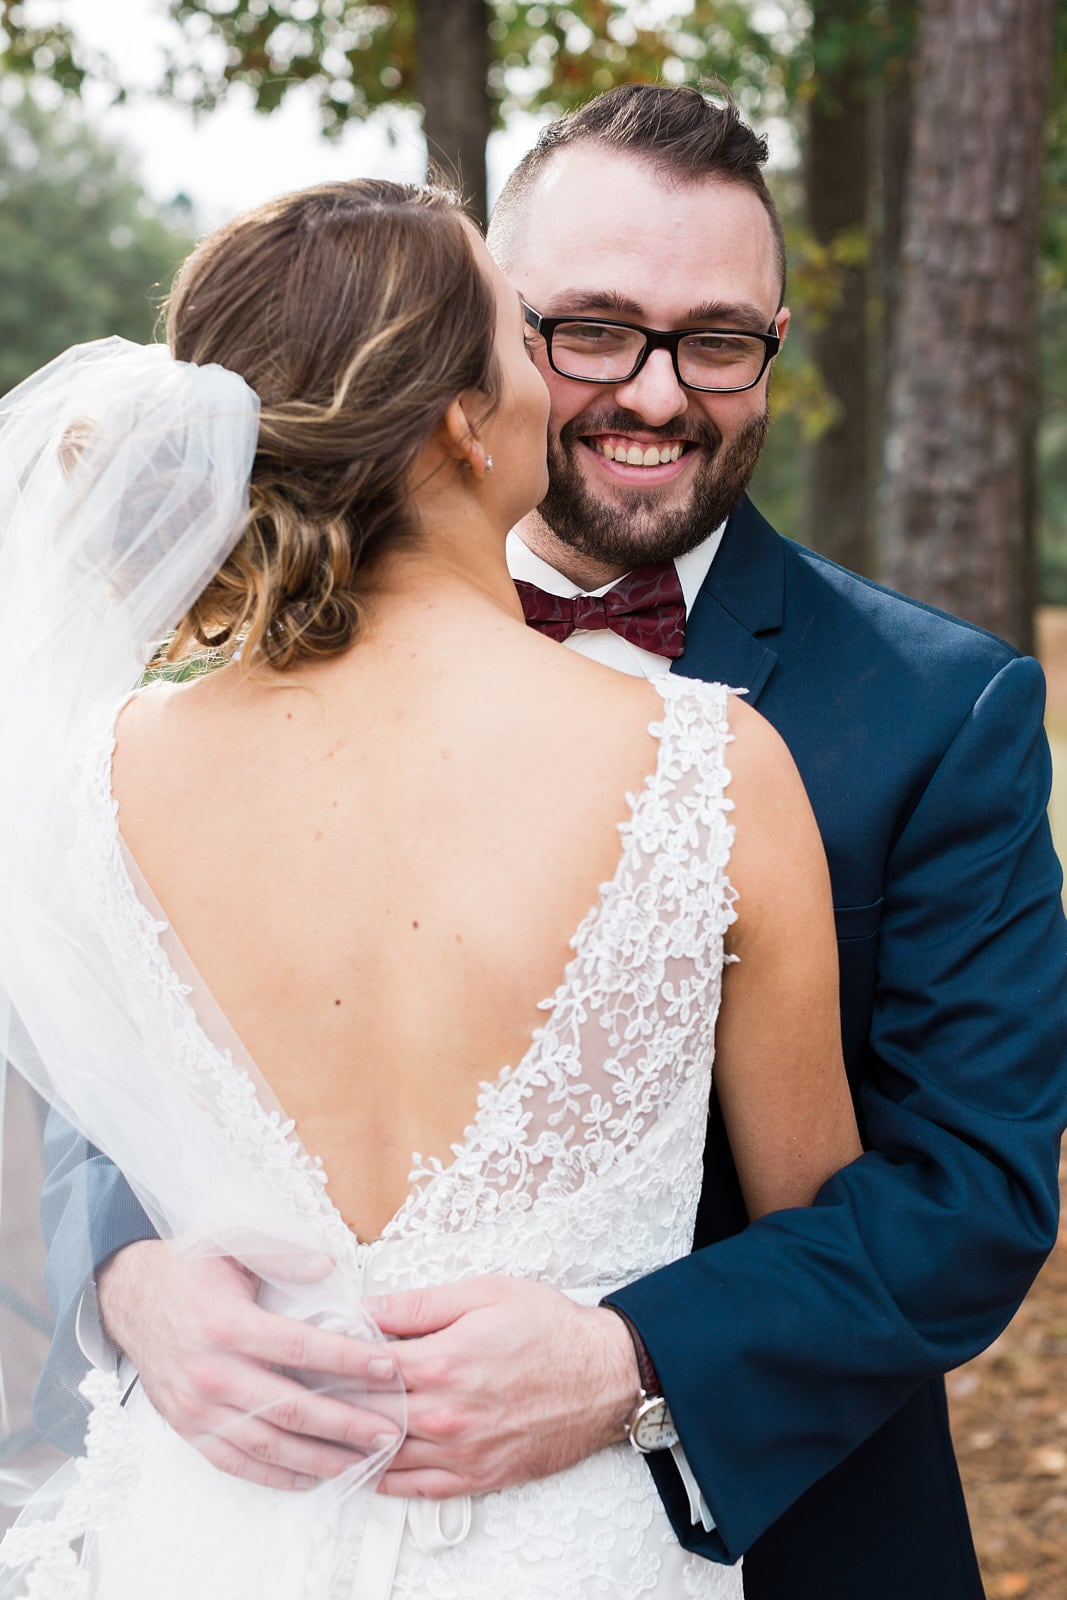 bride kisses groom on cheek at Little River Farms wedding